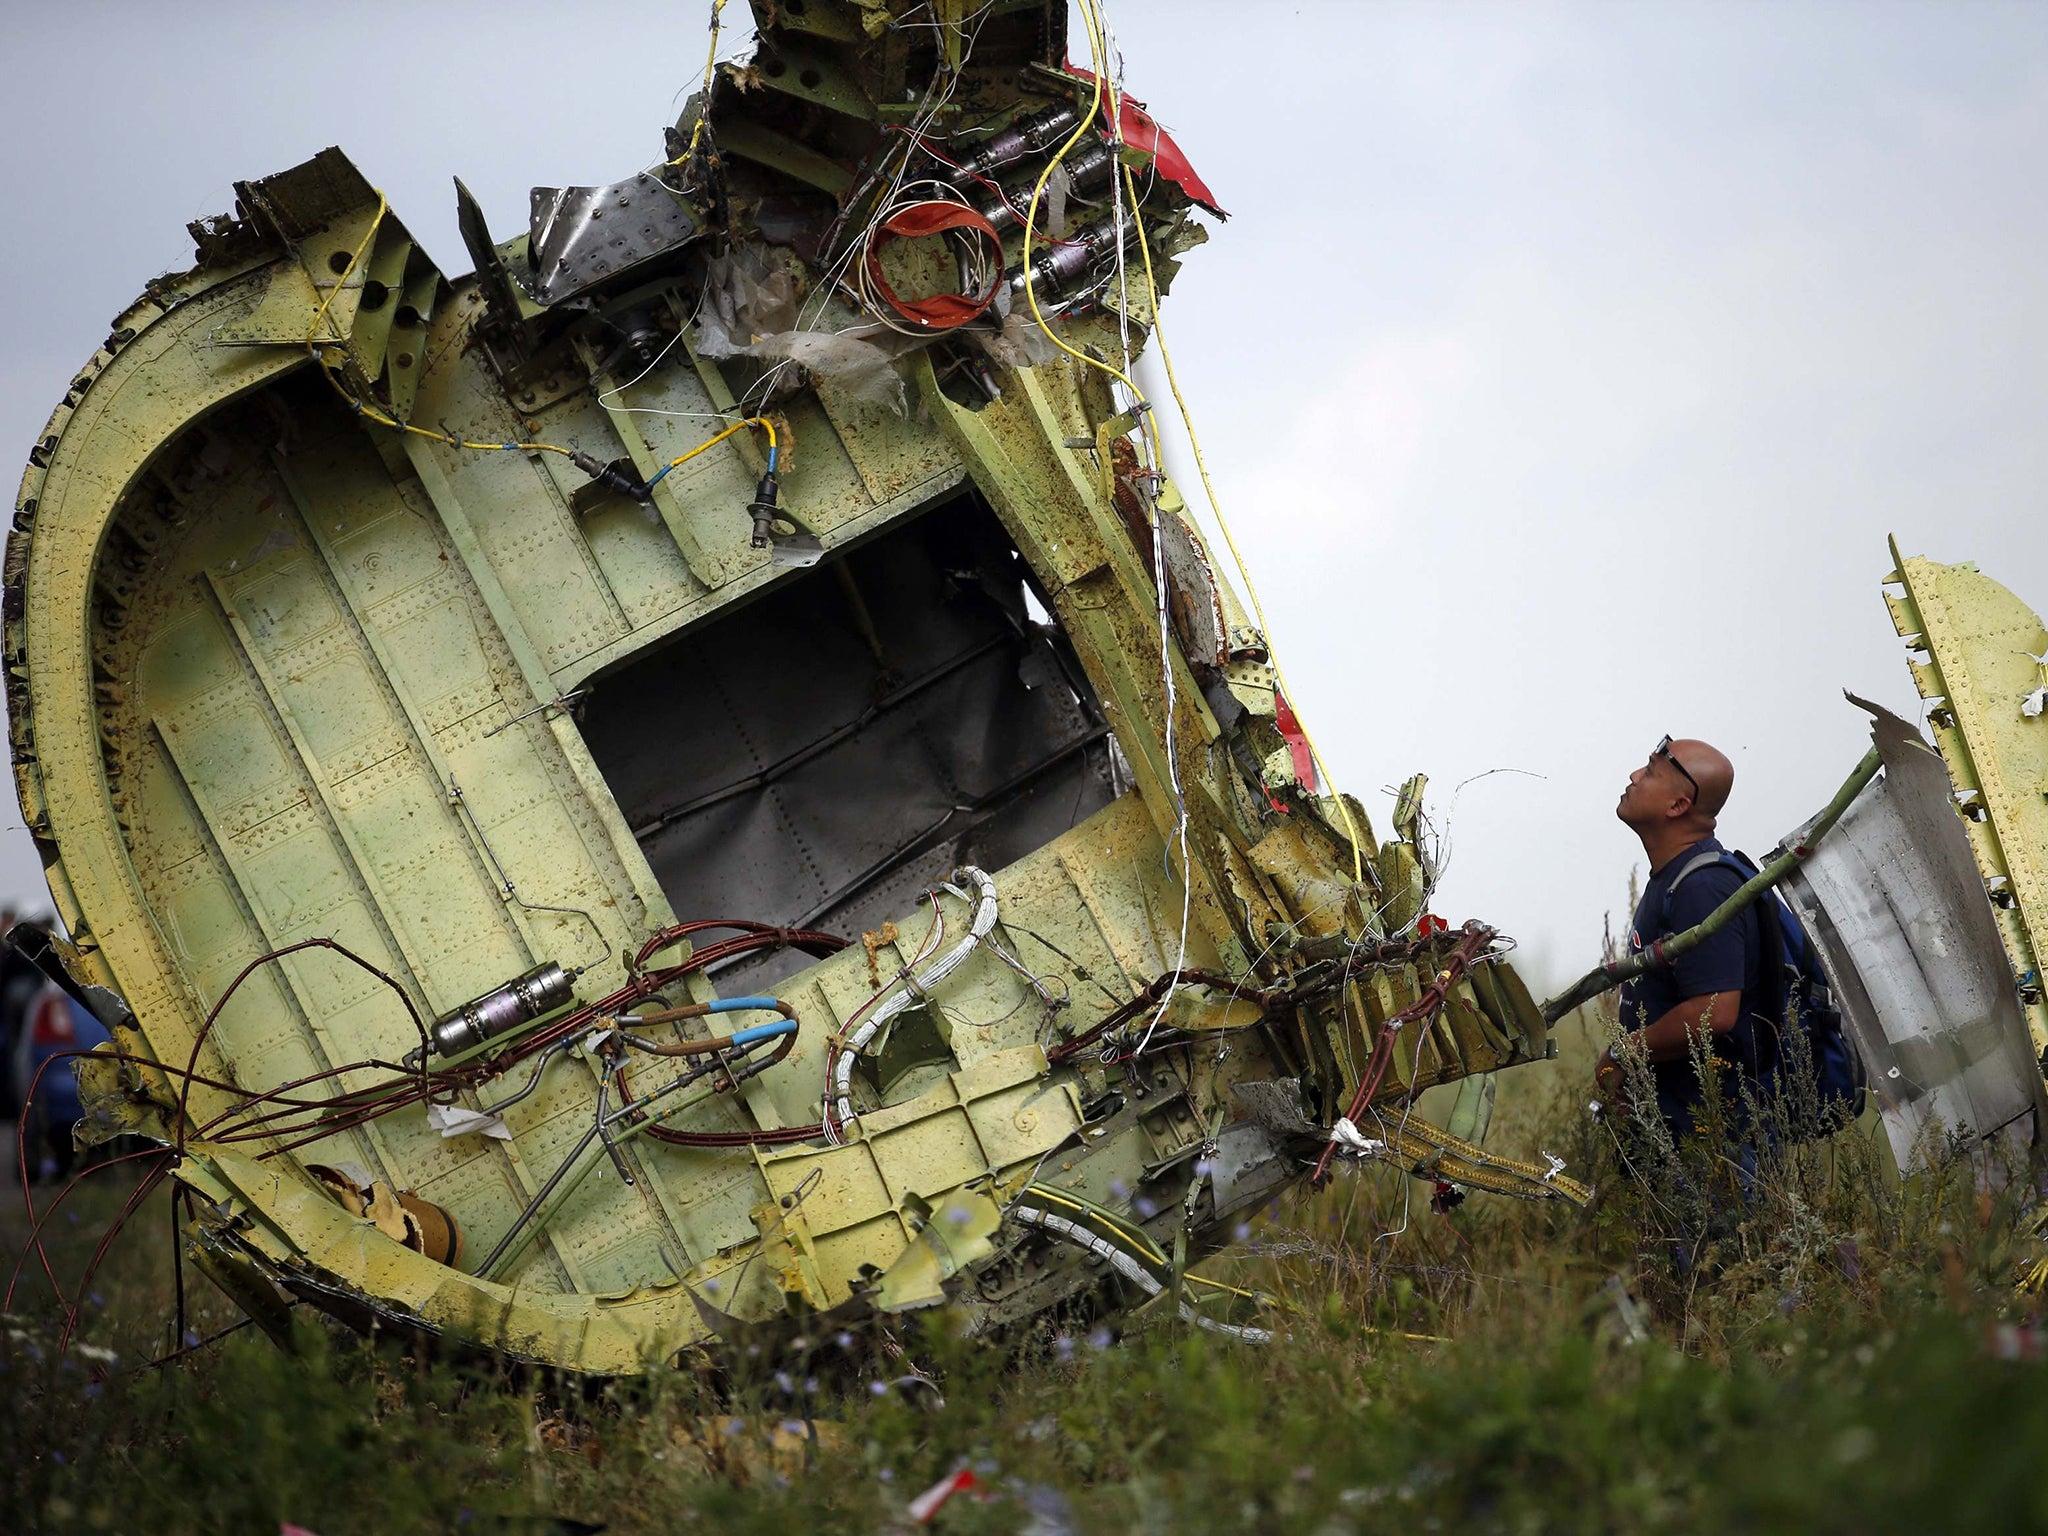 Alexander Malyshev: photopositive, reflection in the plane